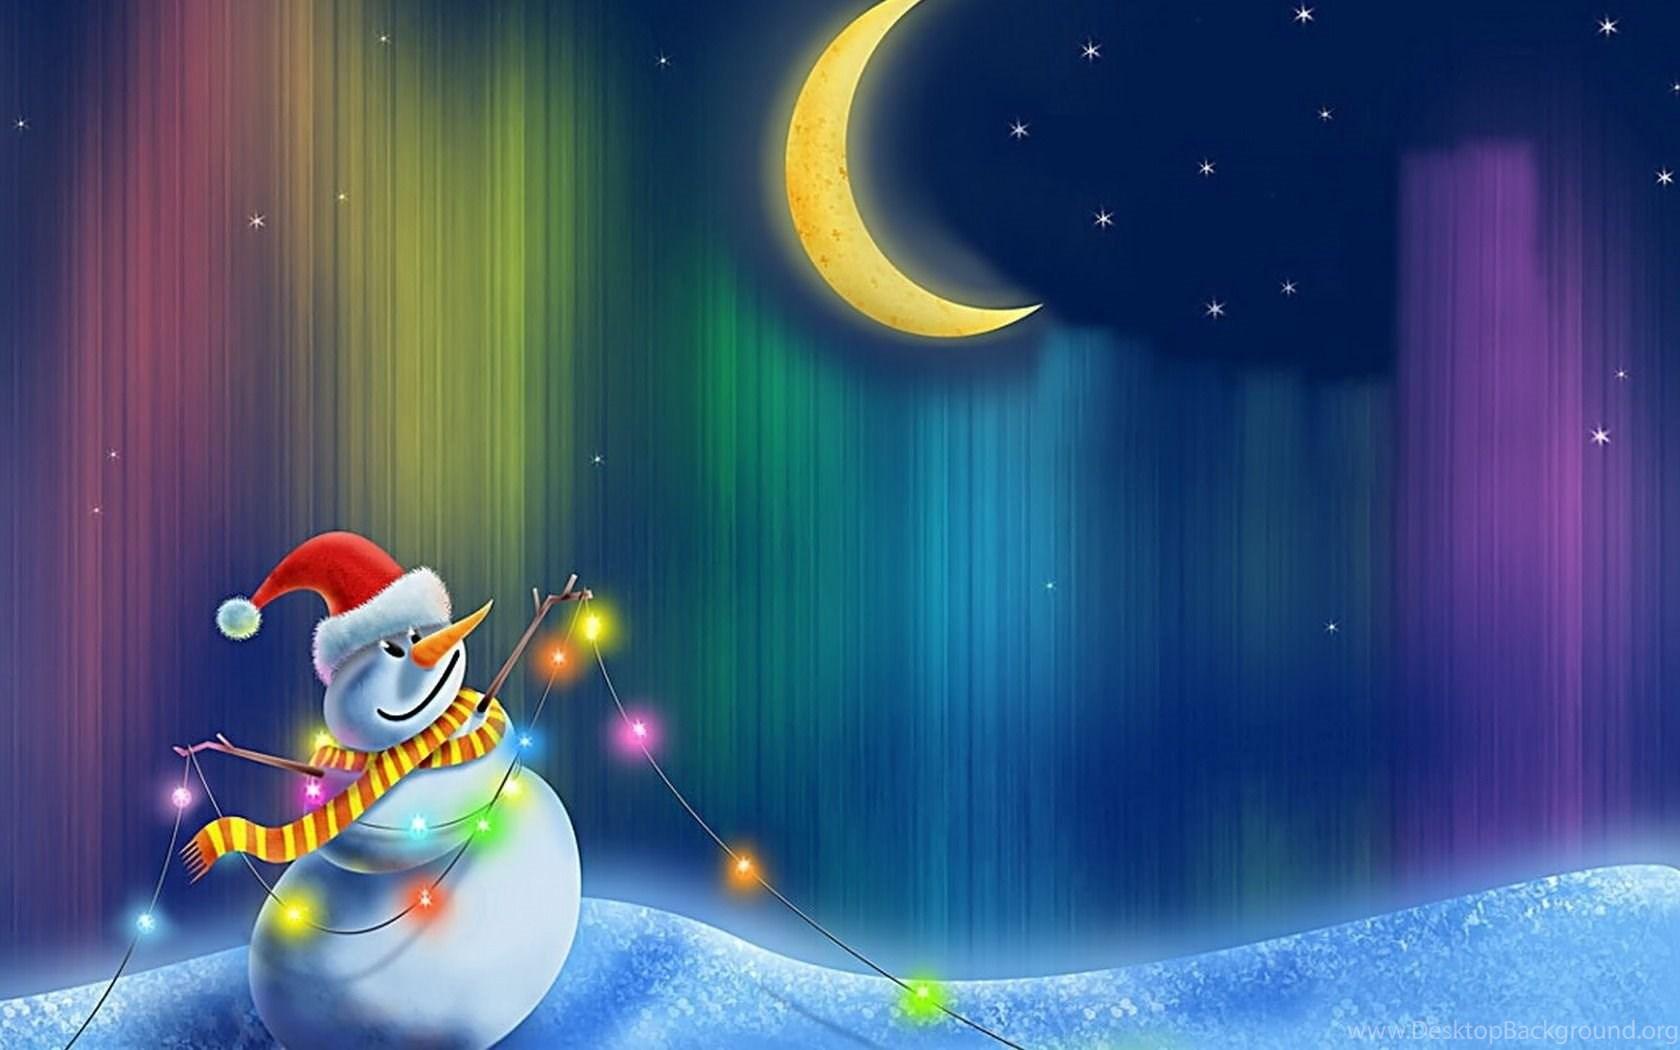 Free Animated Christmas Wallpaper 7 Jpg Desktop Background